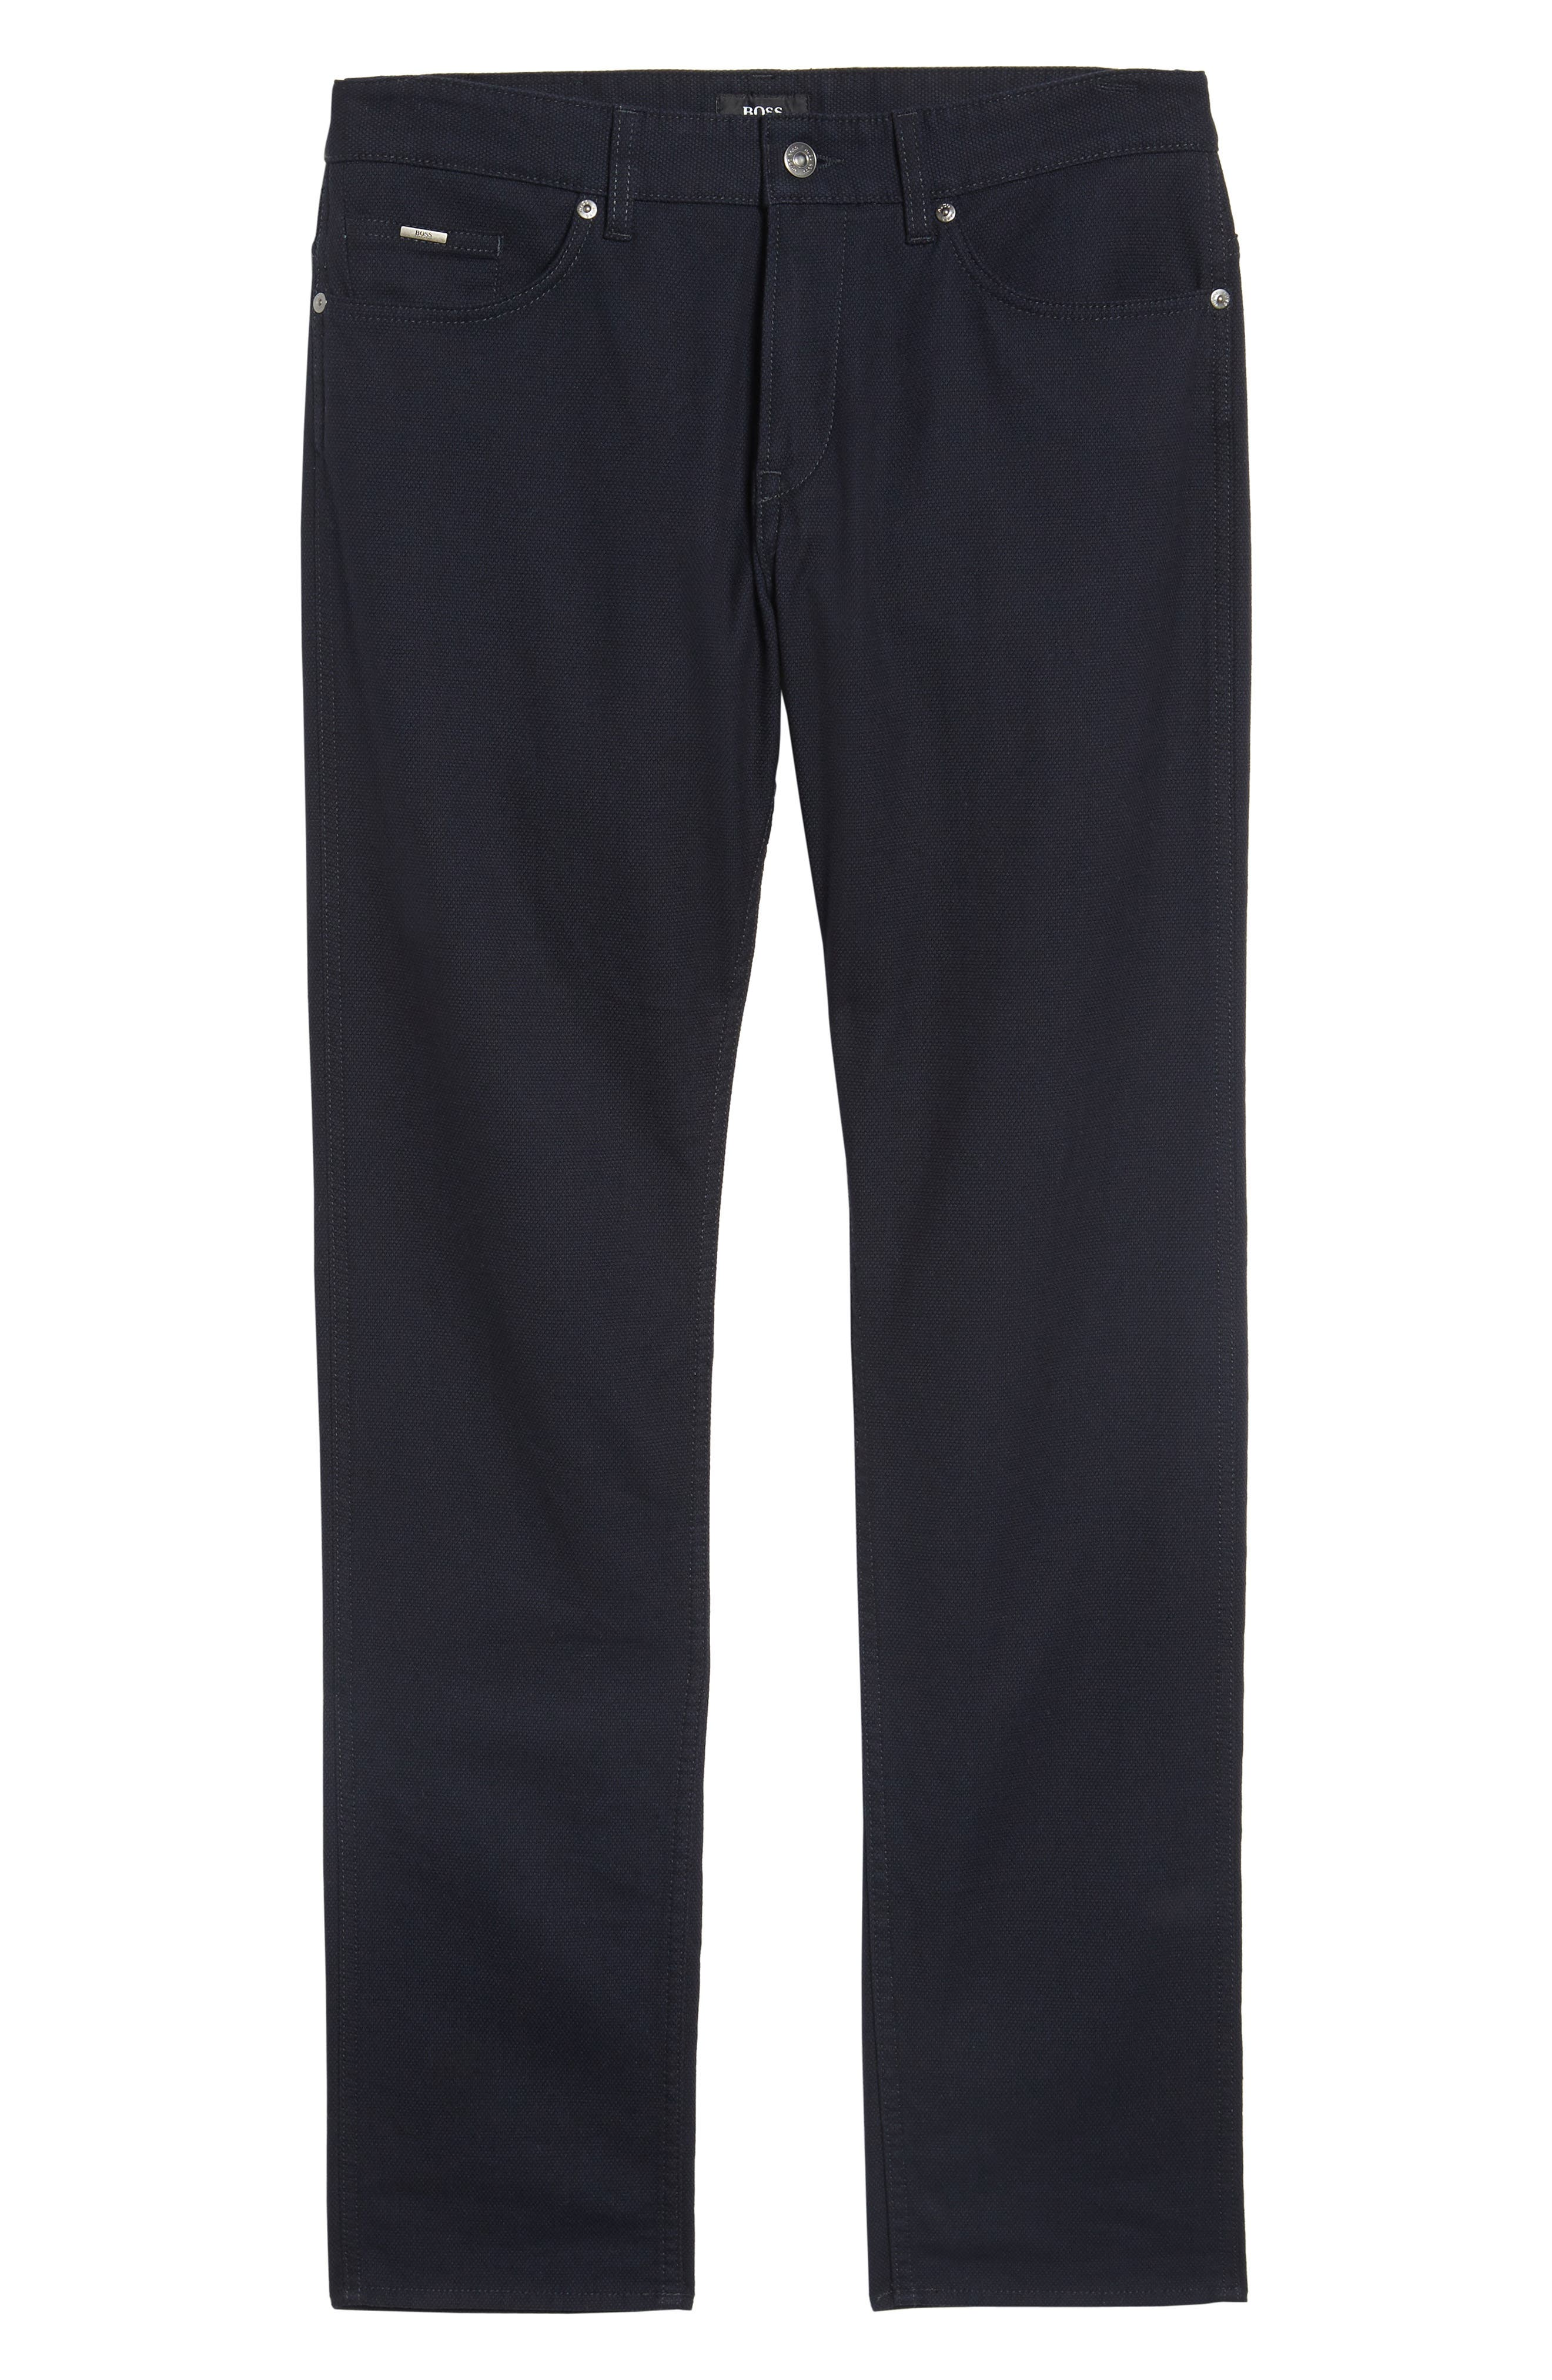 Delaware Slim Microtexture Five Pocket Pants,                             Alternate thumbnail 6, color,                             410